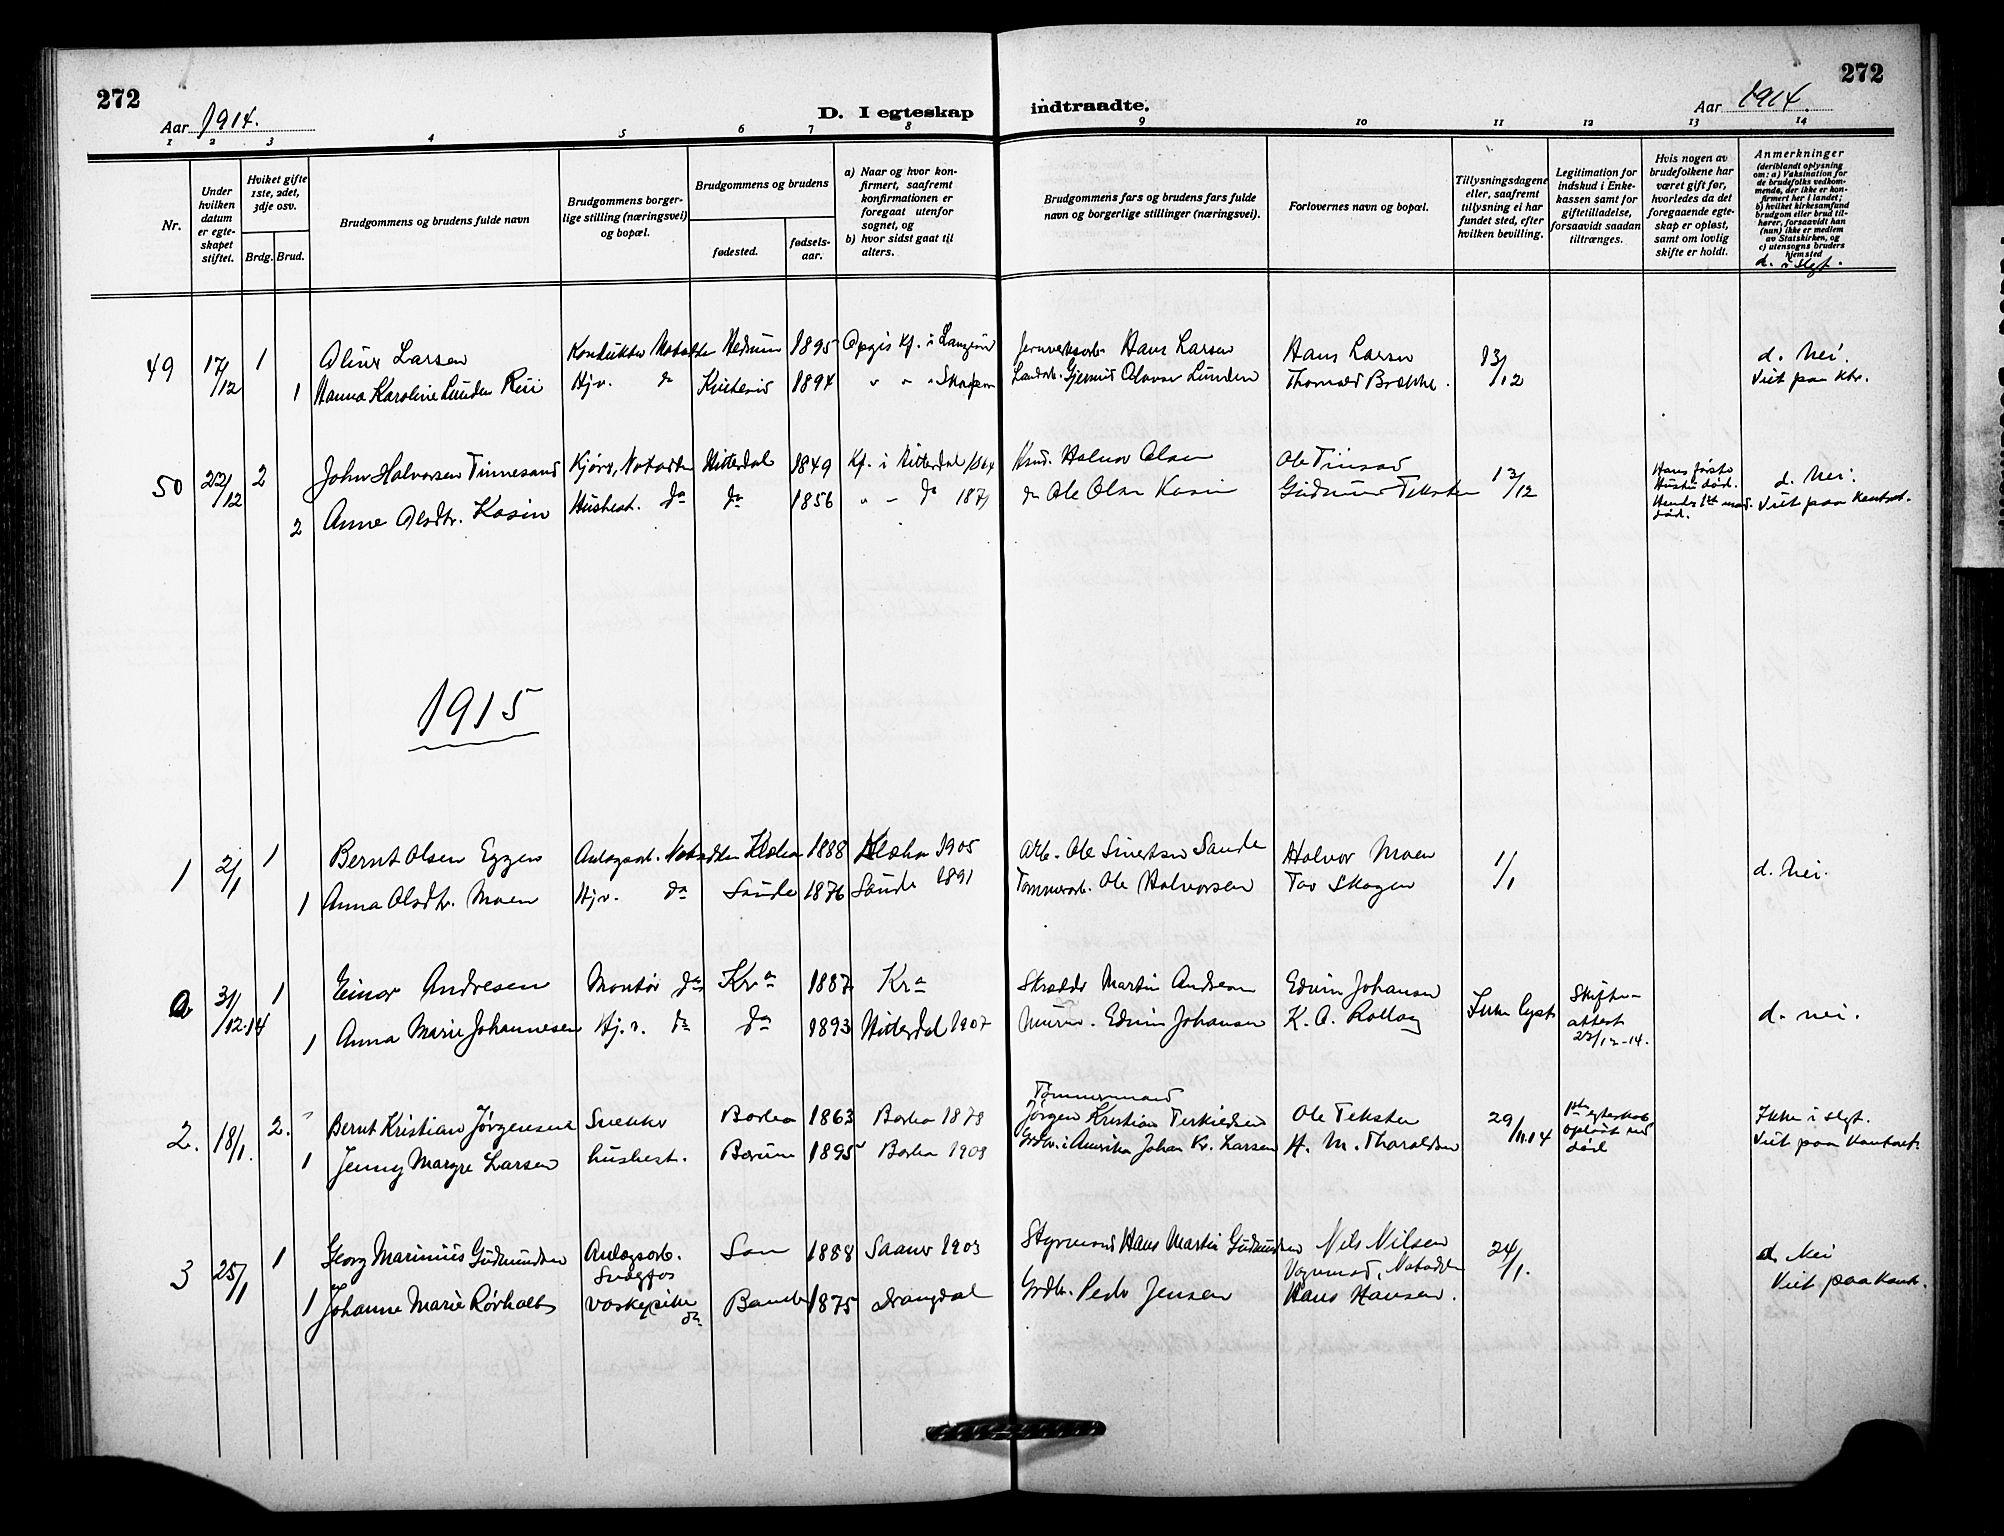 SAKO, Notodden kirkebøker, G/Ga/L0001: Klokkerbok nr. 1, 1912-1923, s. 272